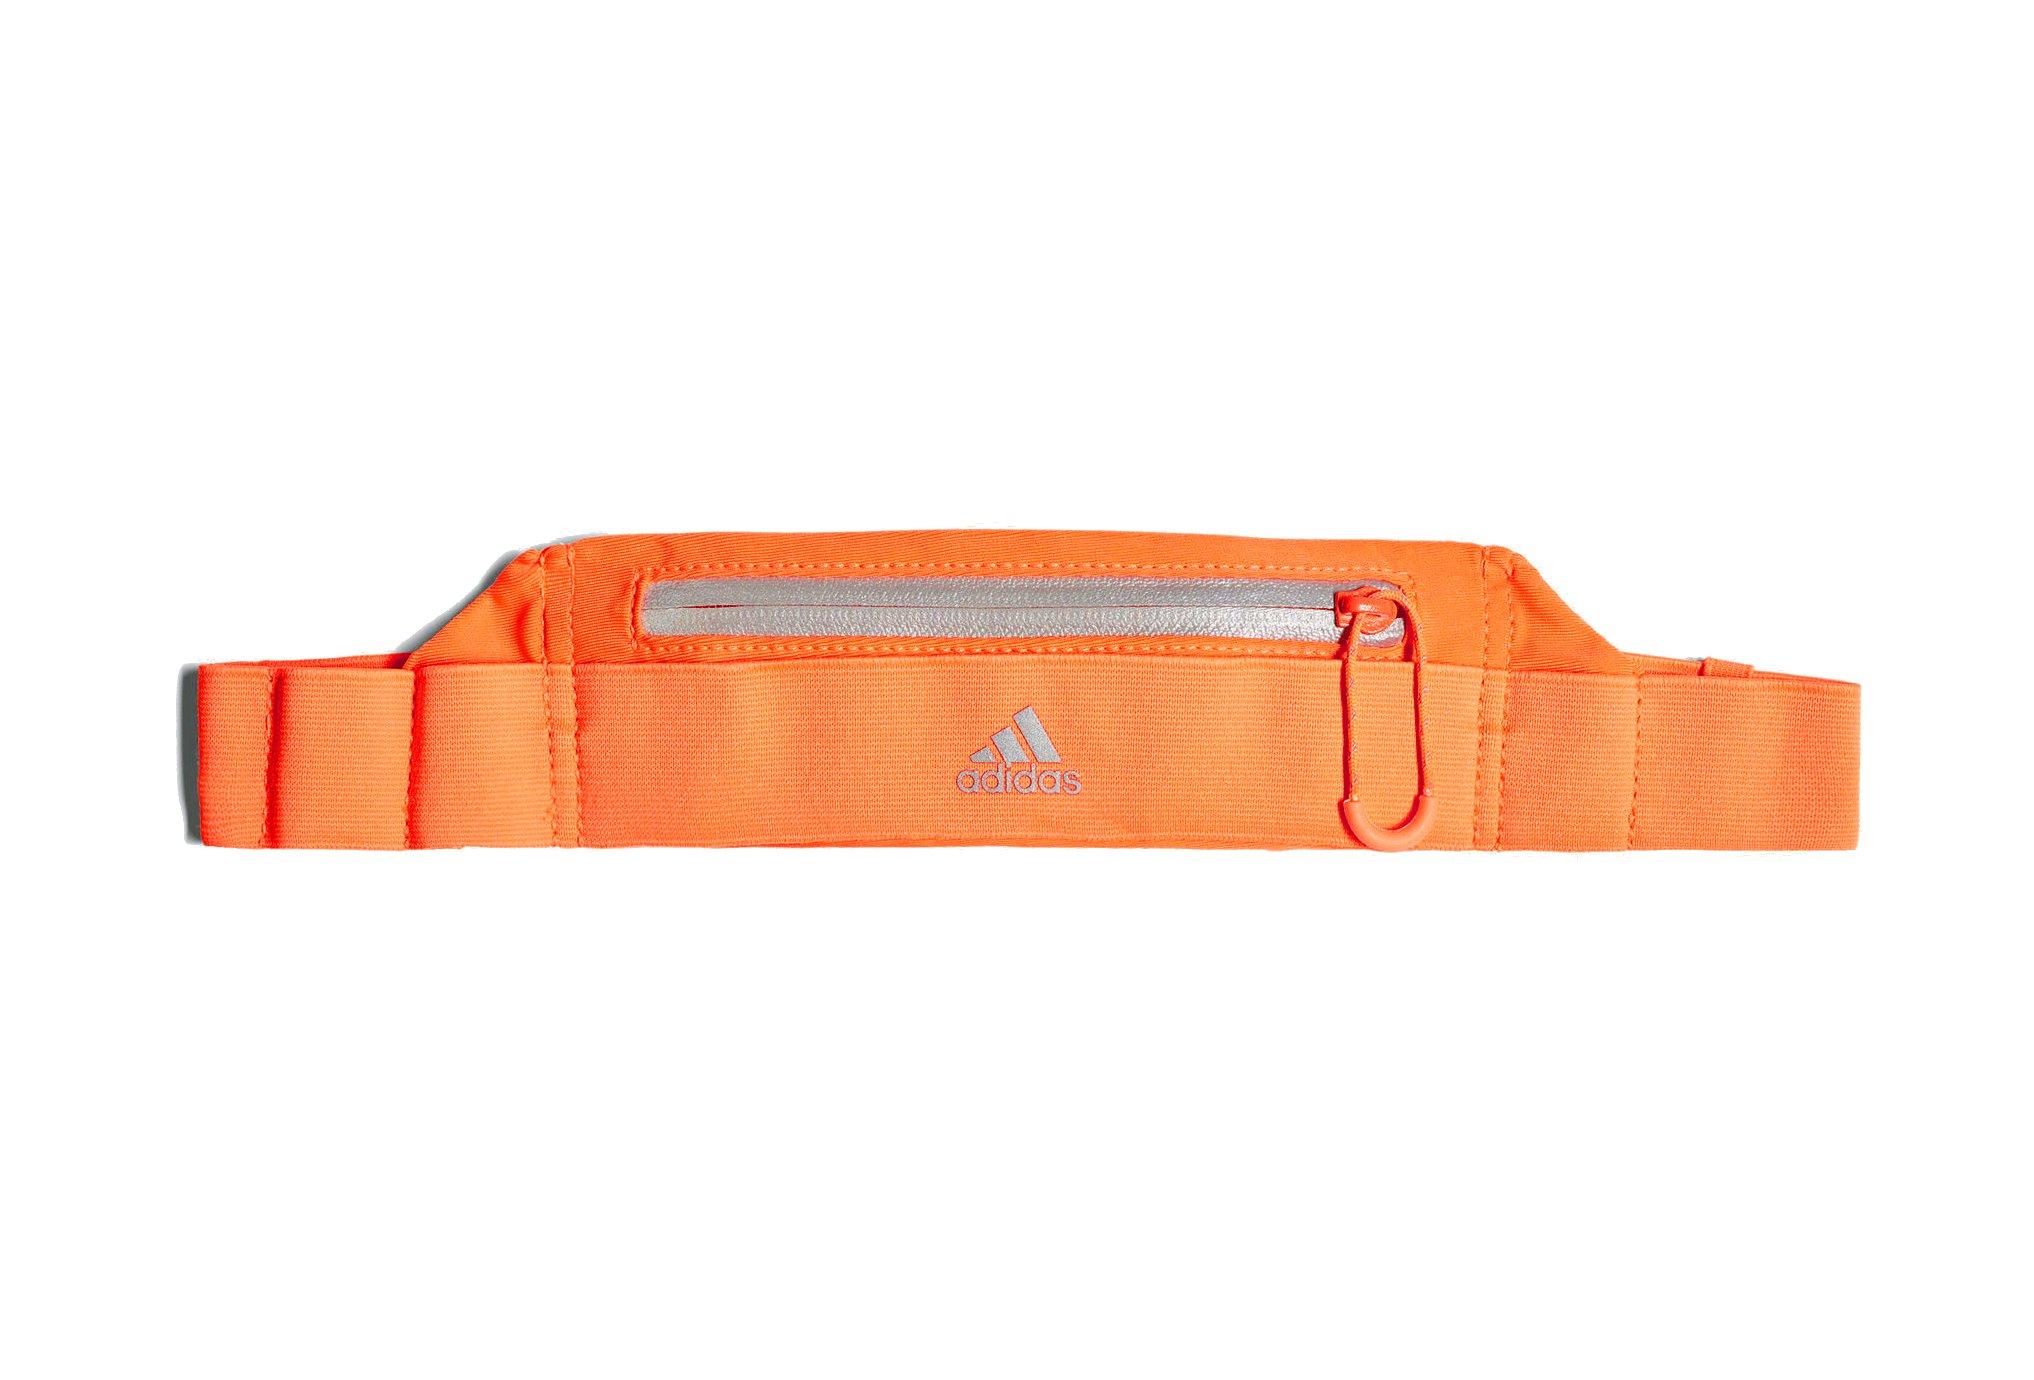 Adidas Run belt ceinture / porte dossard